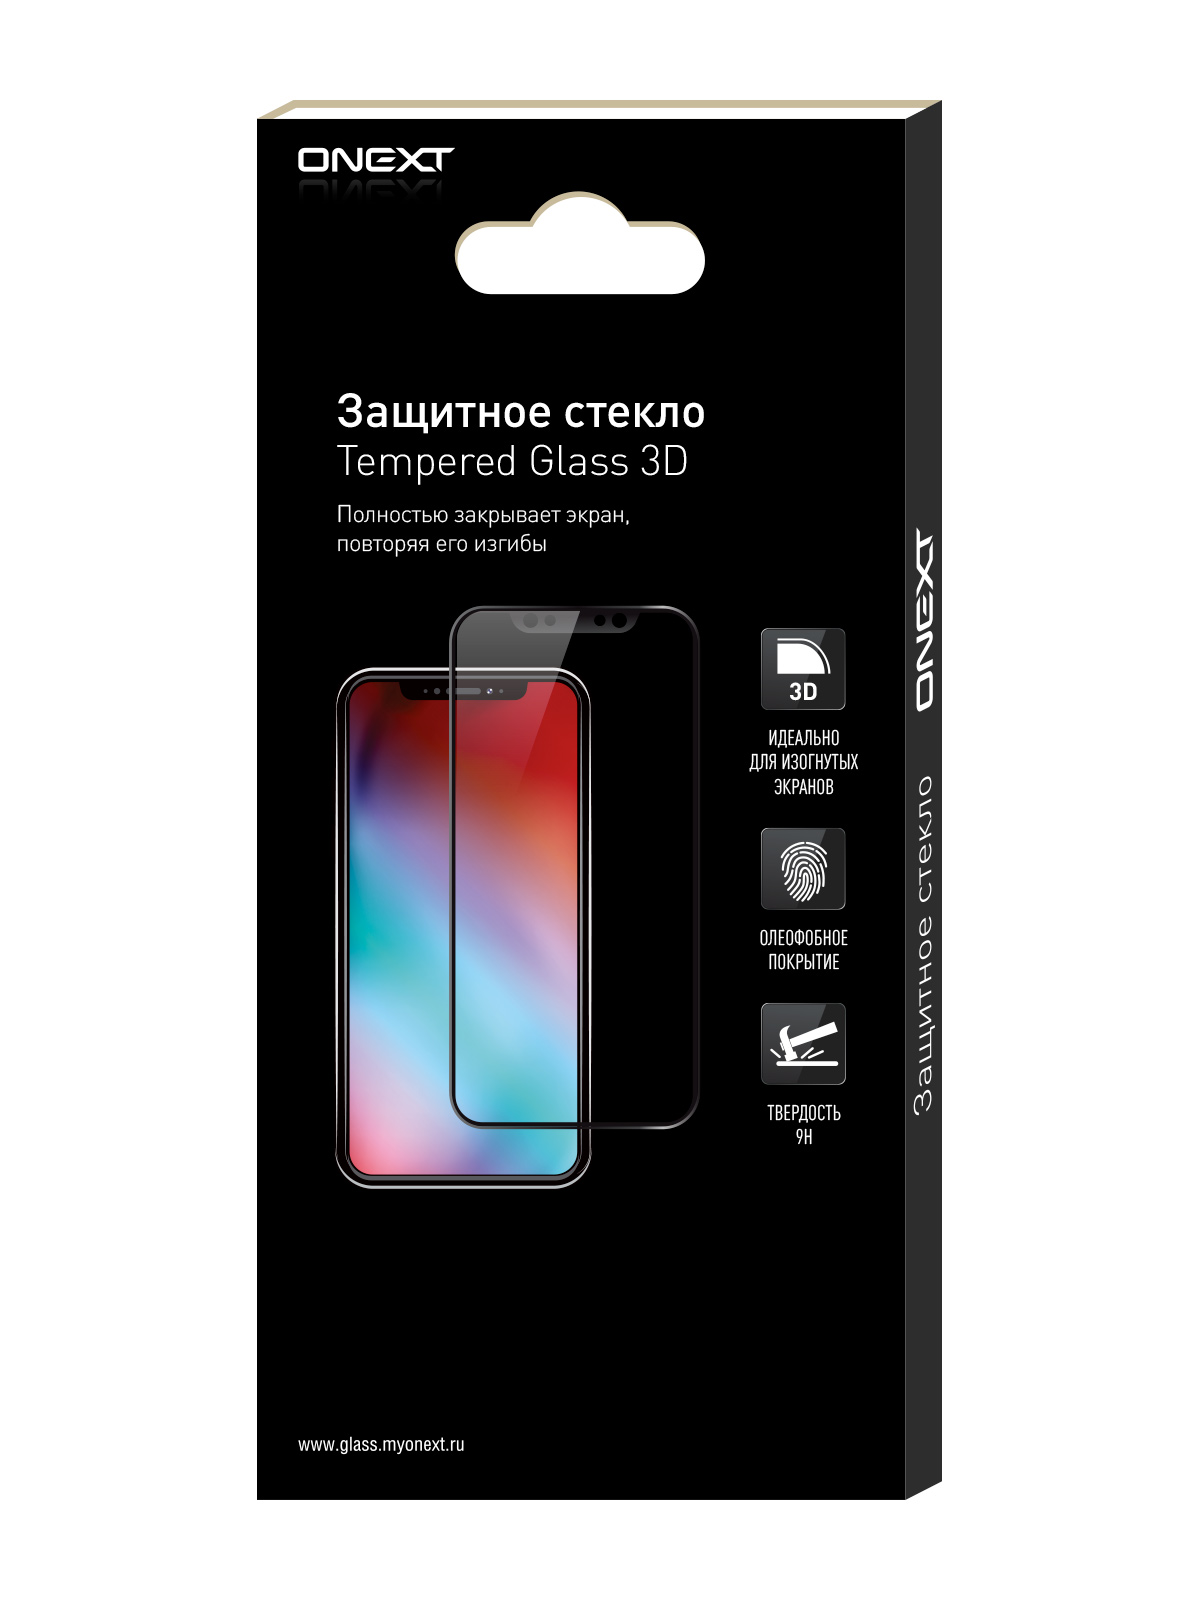 Защитное стекло ONEXT для Apple iPhone 7 Plus Red